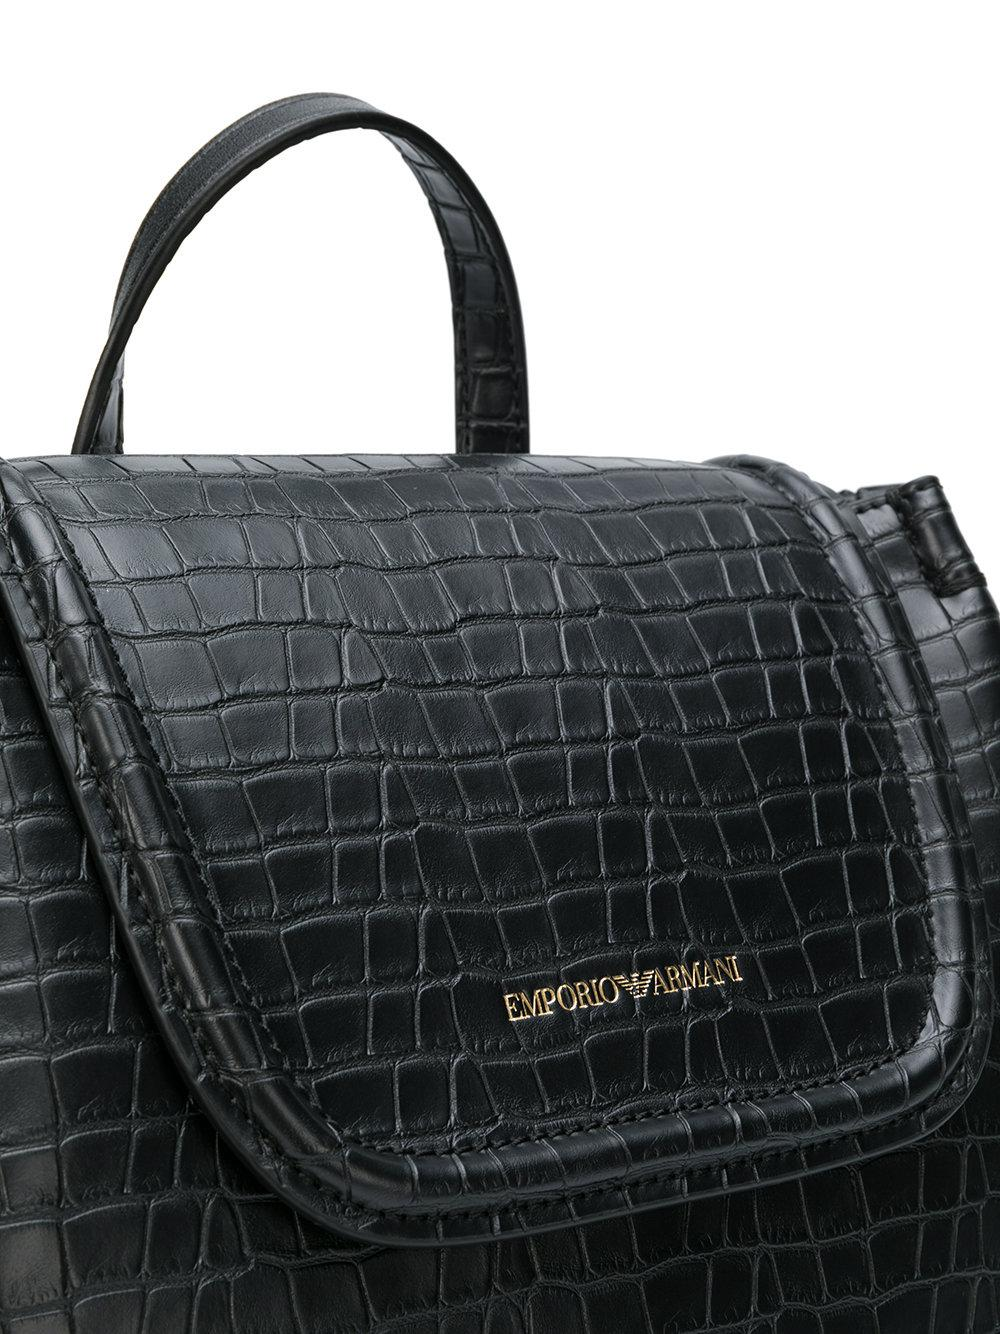 c5798568838 Lyst - Emporio Armani Croc Embossed Backpack in Black